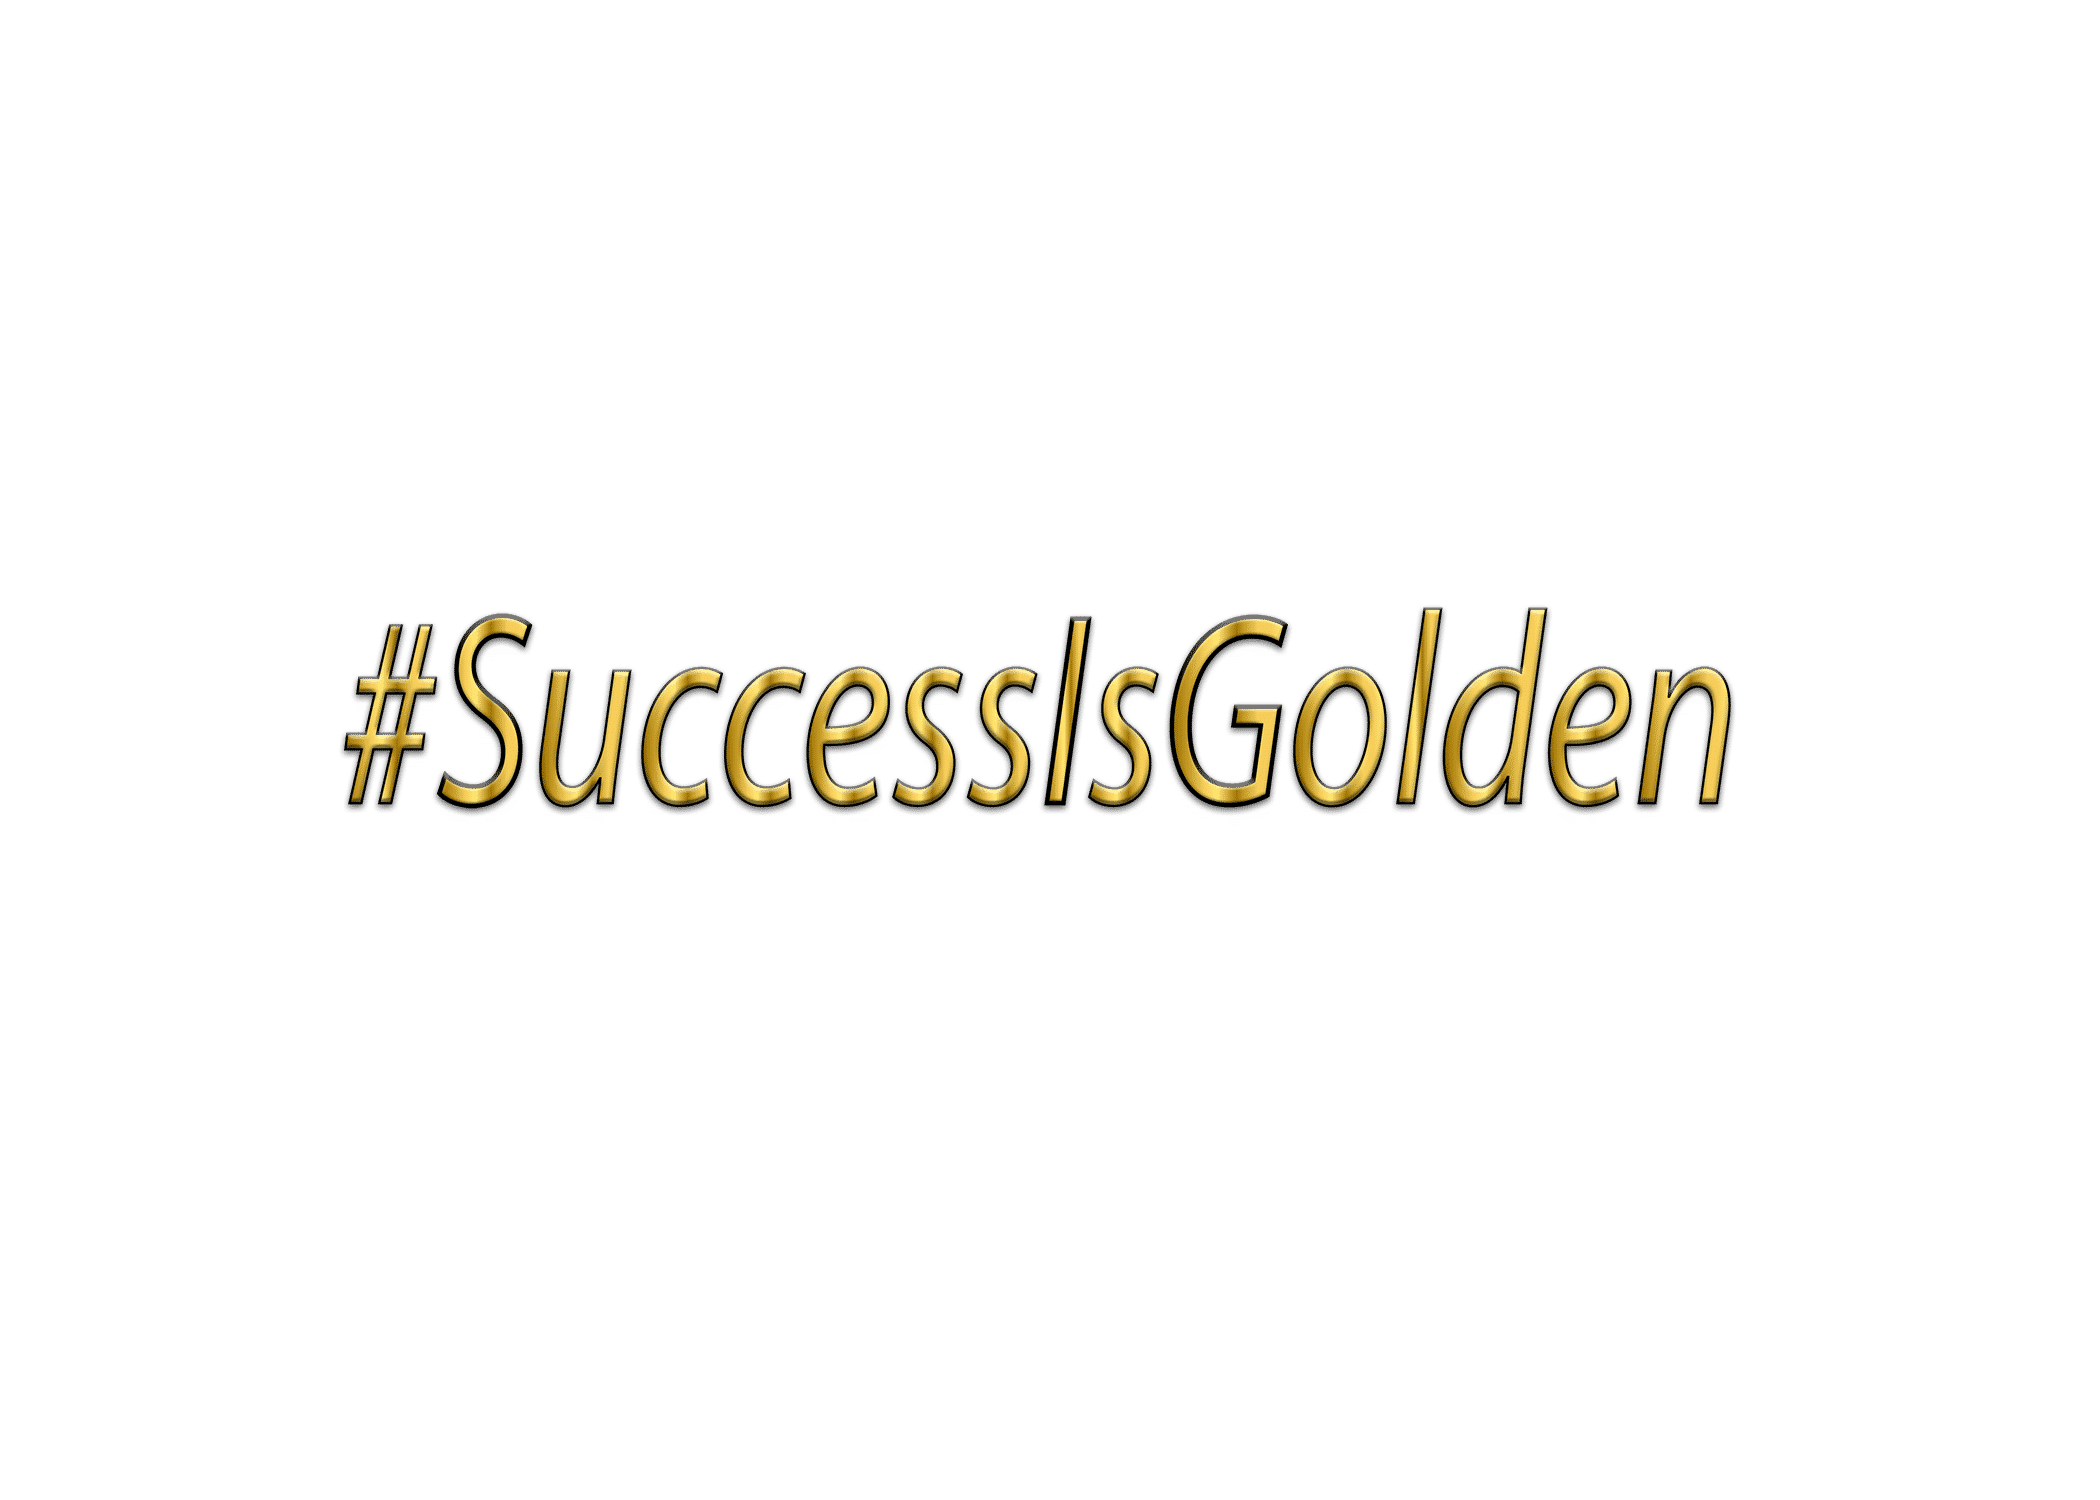 SUCCESS IS GOLDEN- EMBOSS